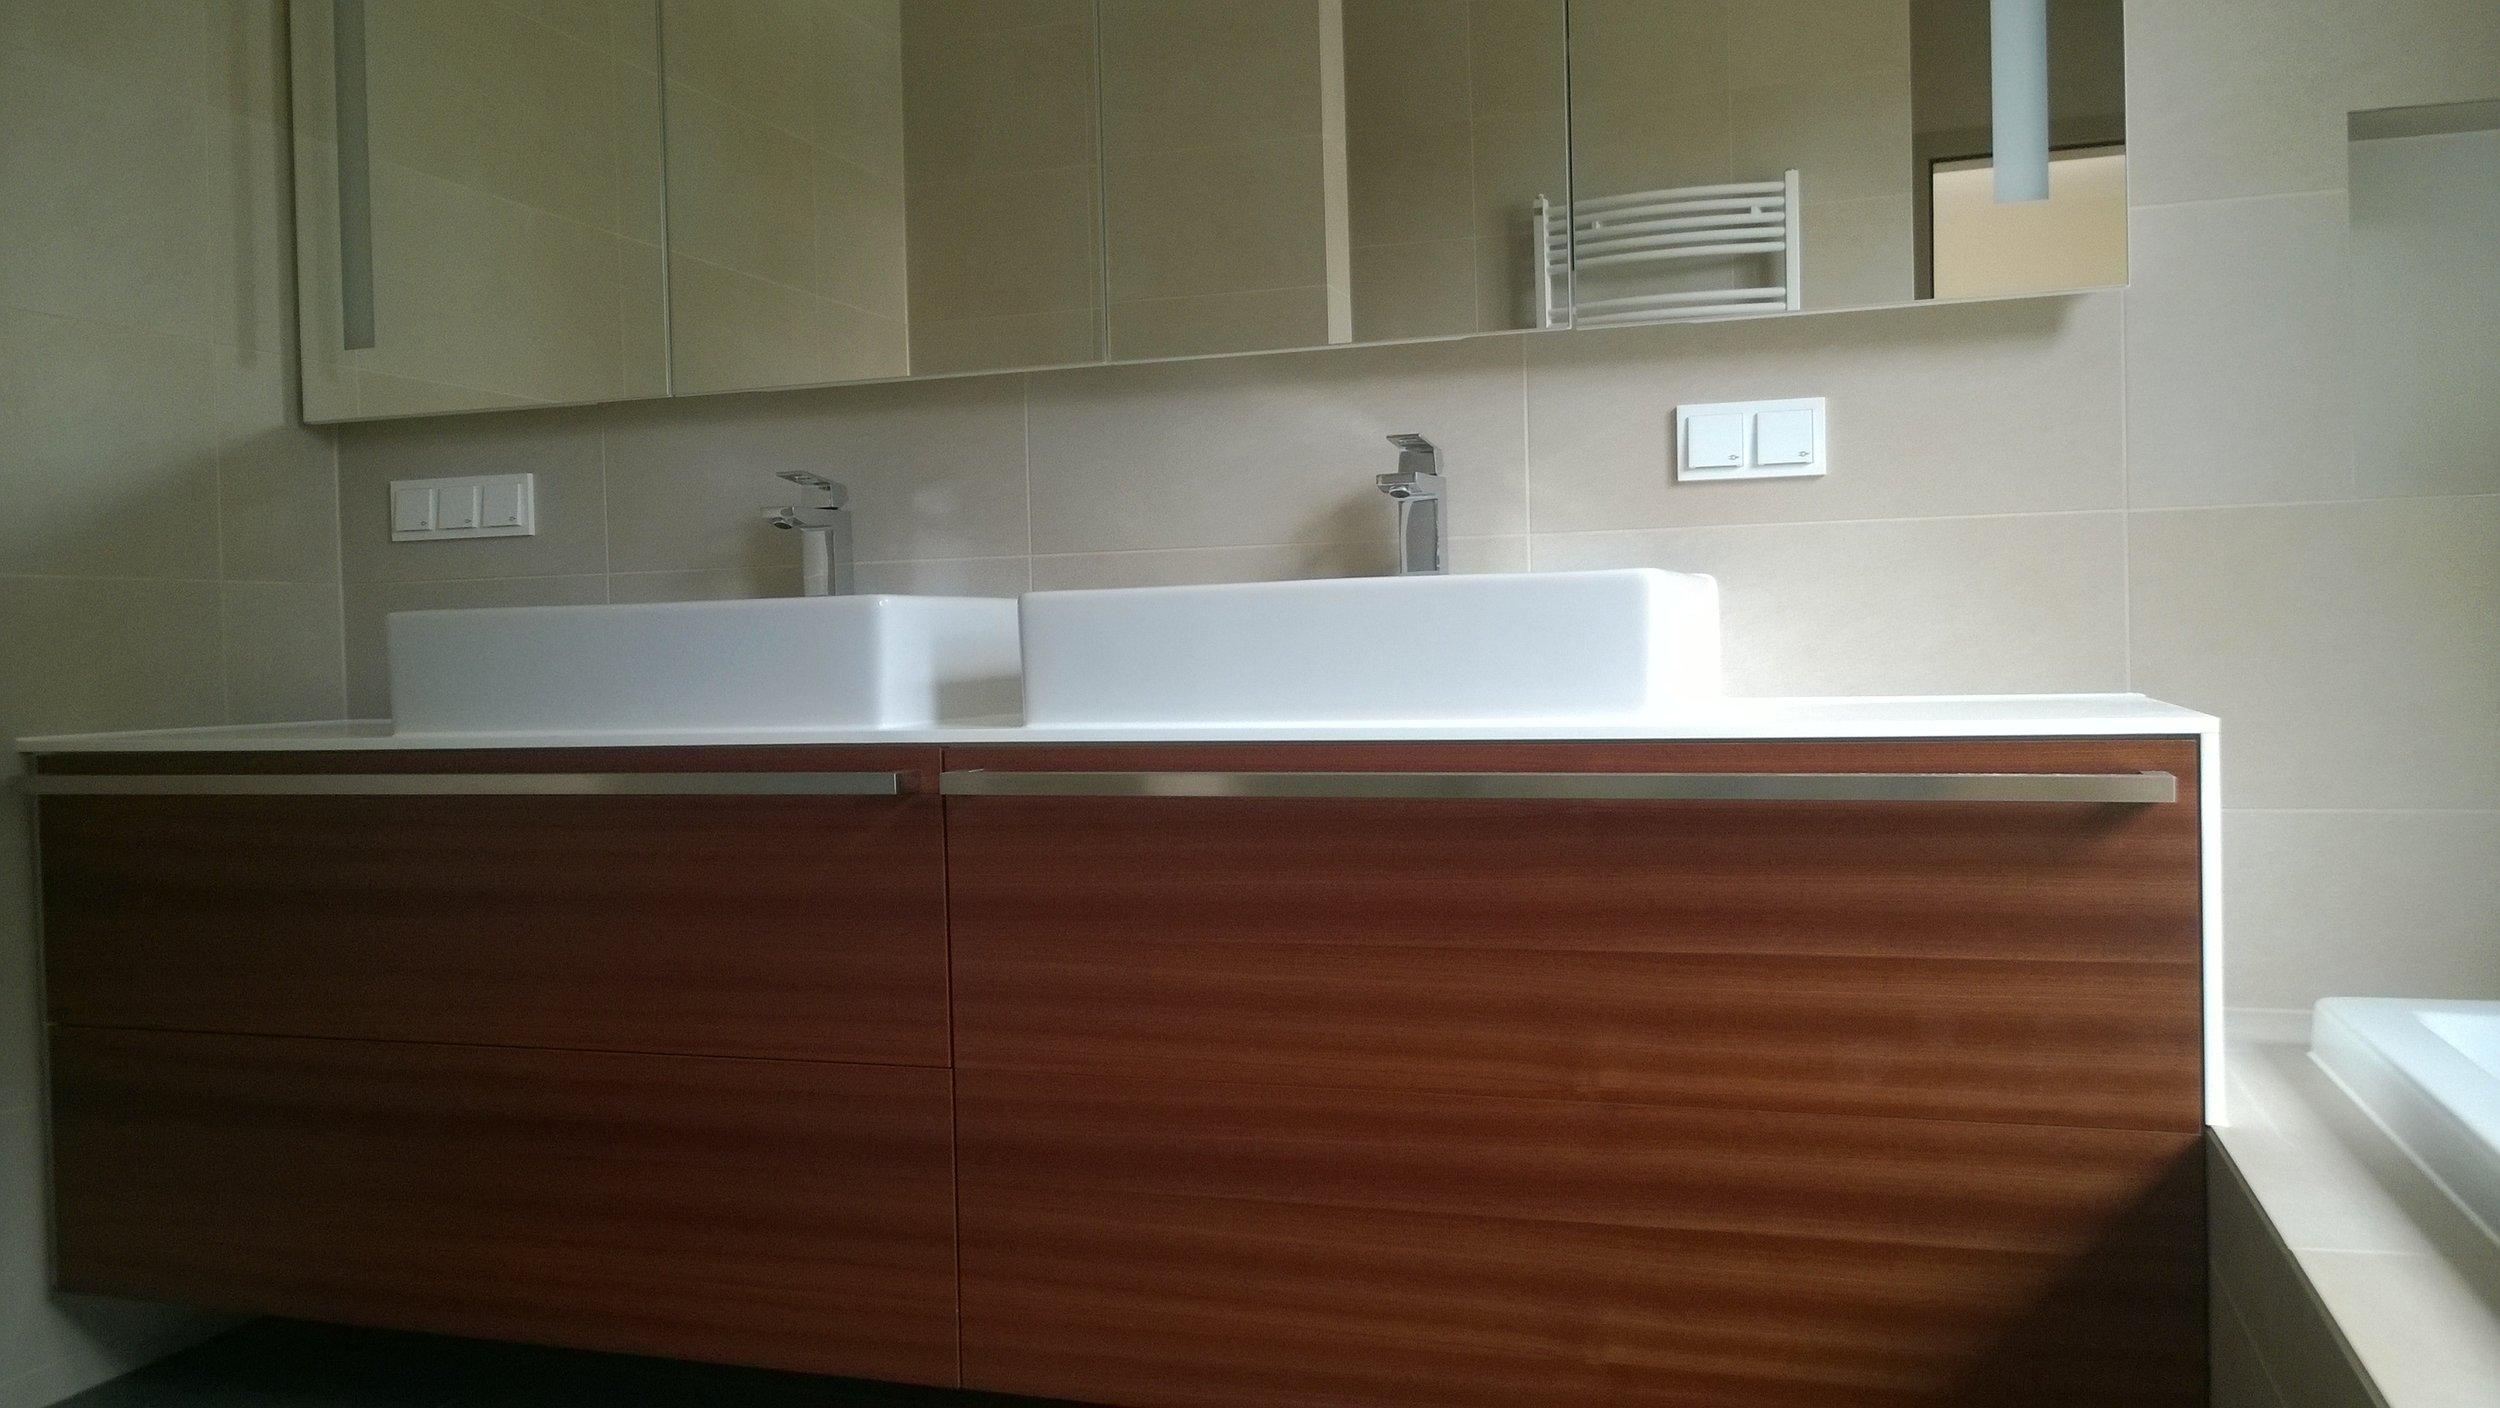 Splash! Bathrooms         Normal 0   21   false false false  DE X-NONE X-NONE                                                                                                                                                                                                                                                                                                                                                                                                                                                   /* Style Definitions */ table.MsoNormalTable {mso-style-name: